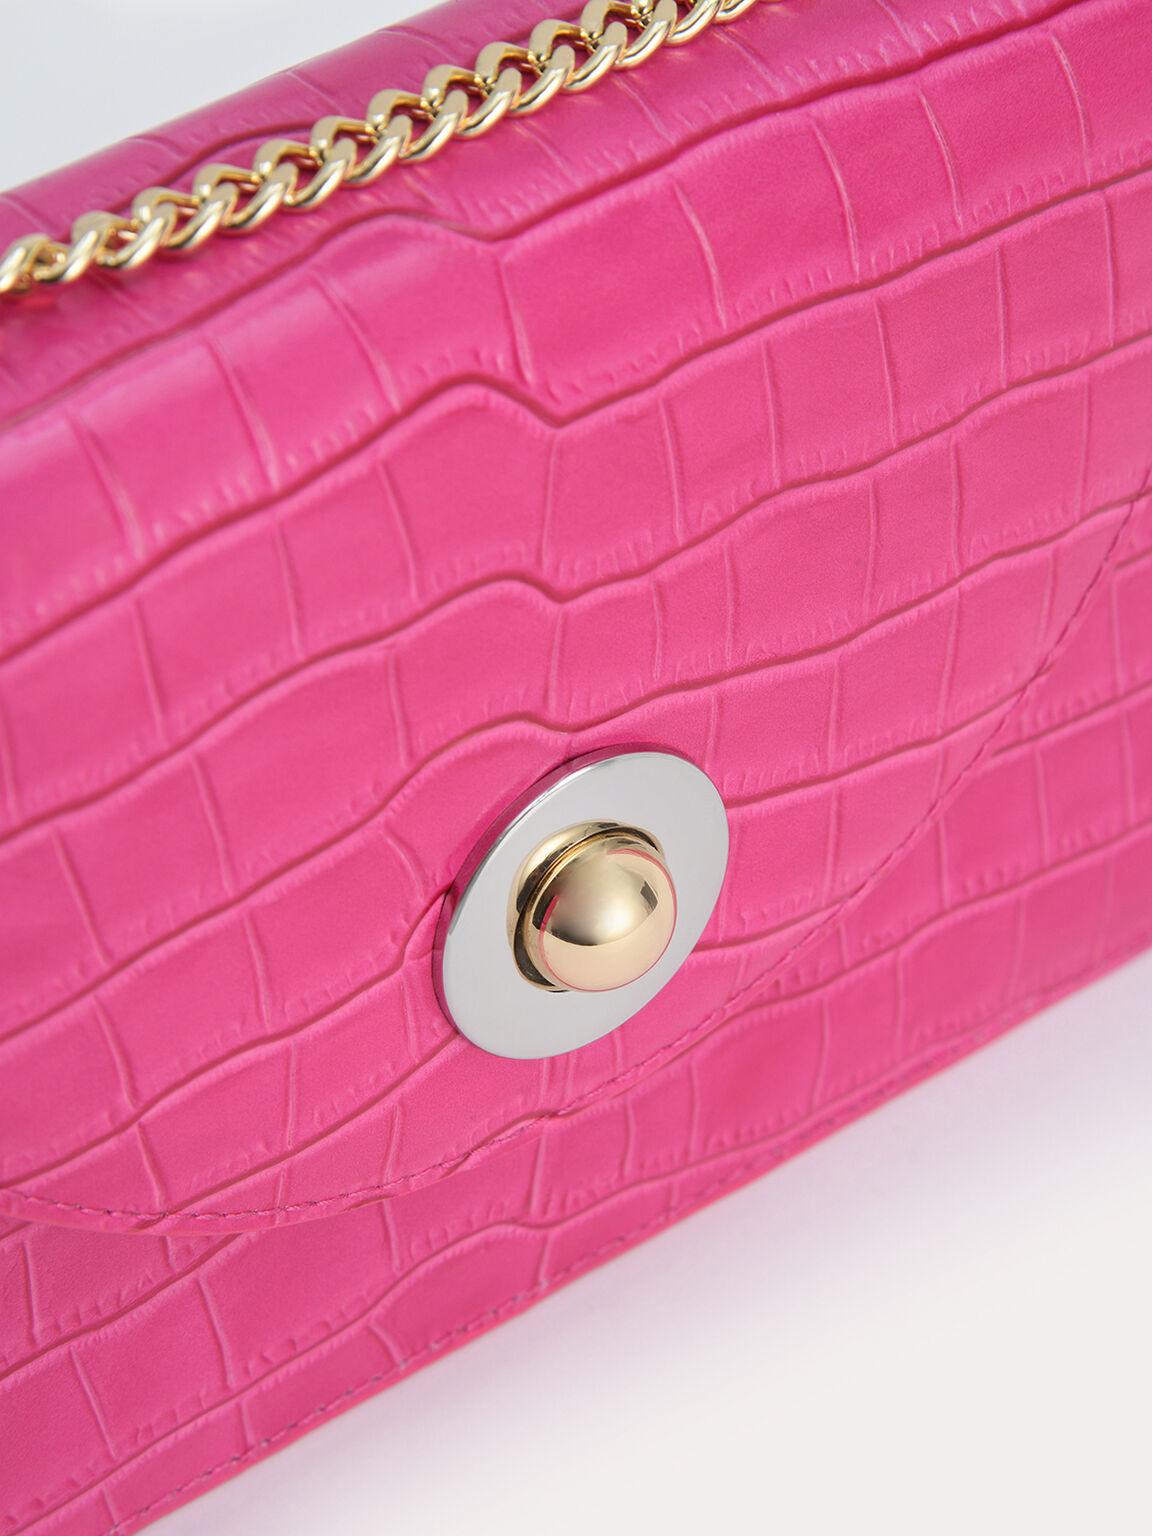 Textured Leather Travel Organisers, Fuchsia, hi-res